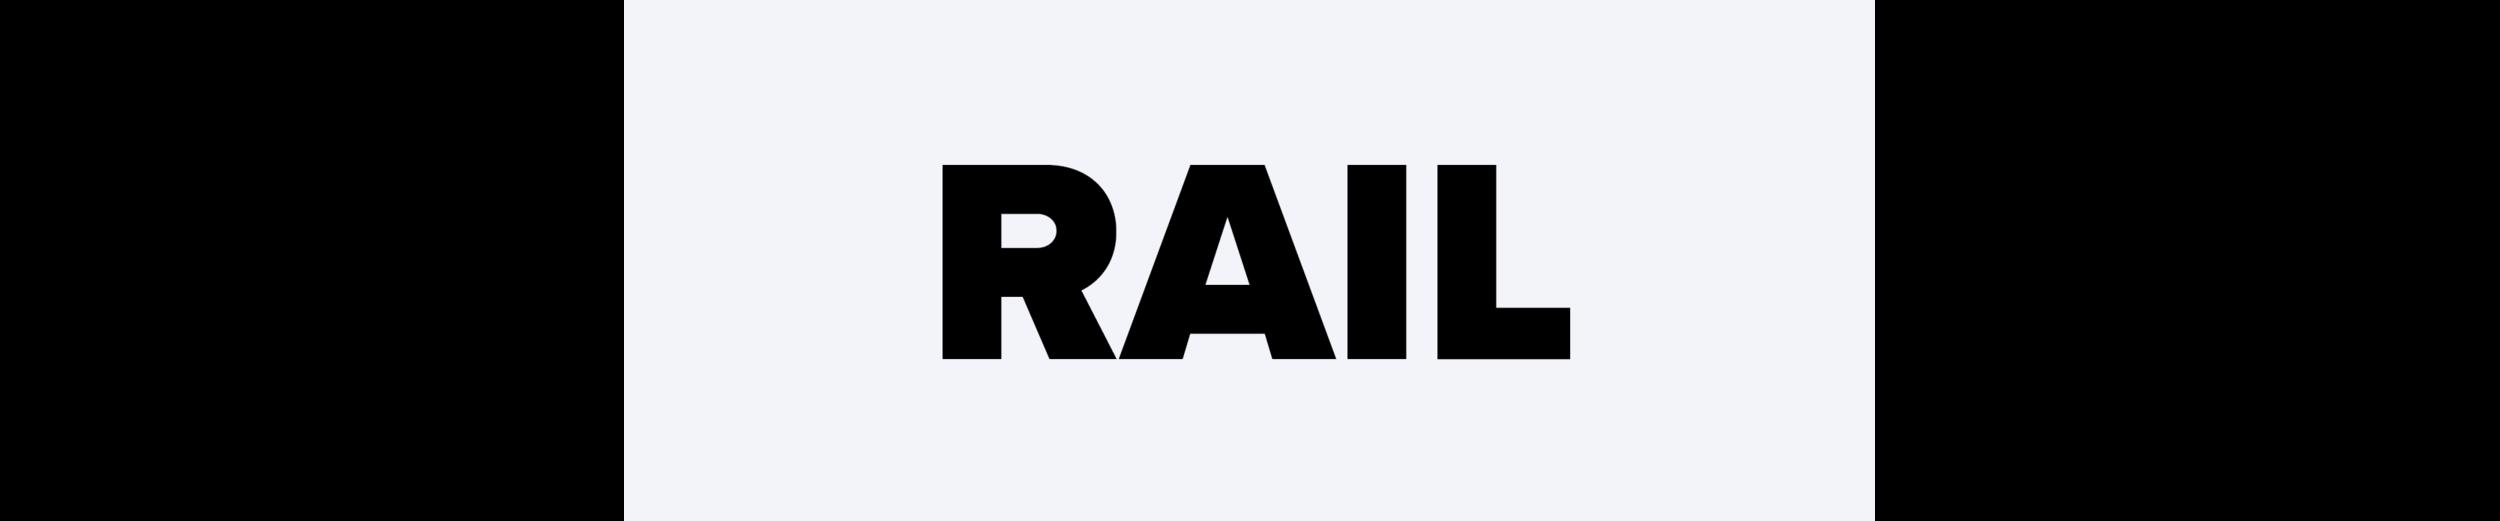 Rail Title-01.png